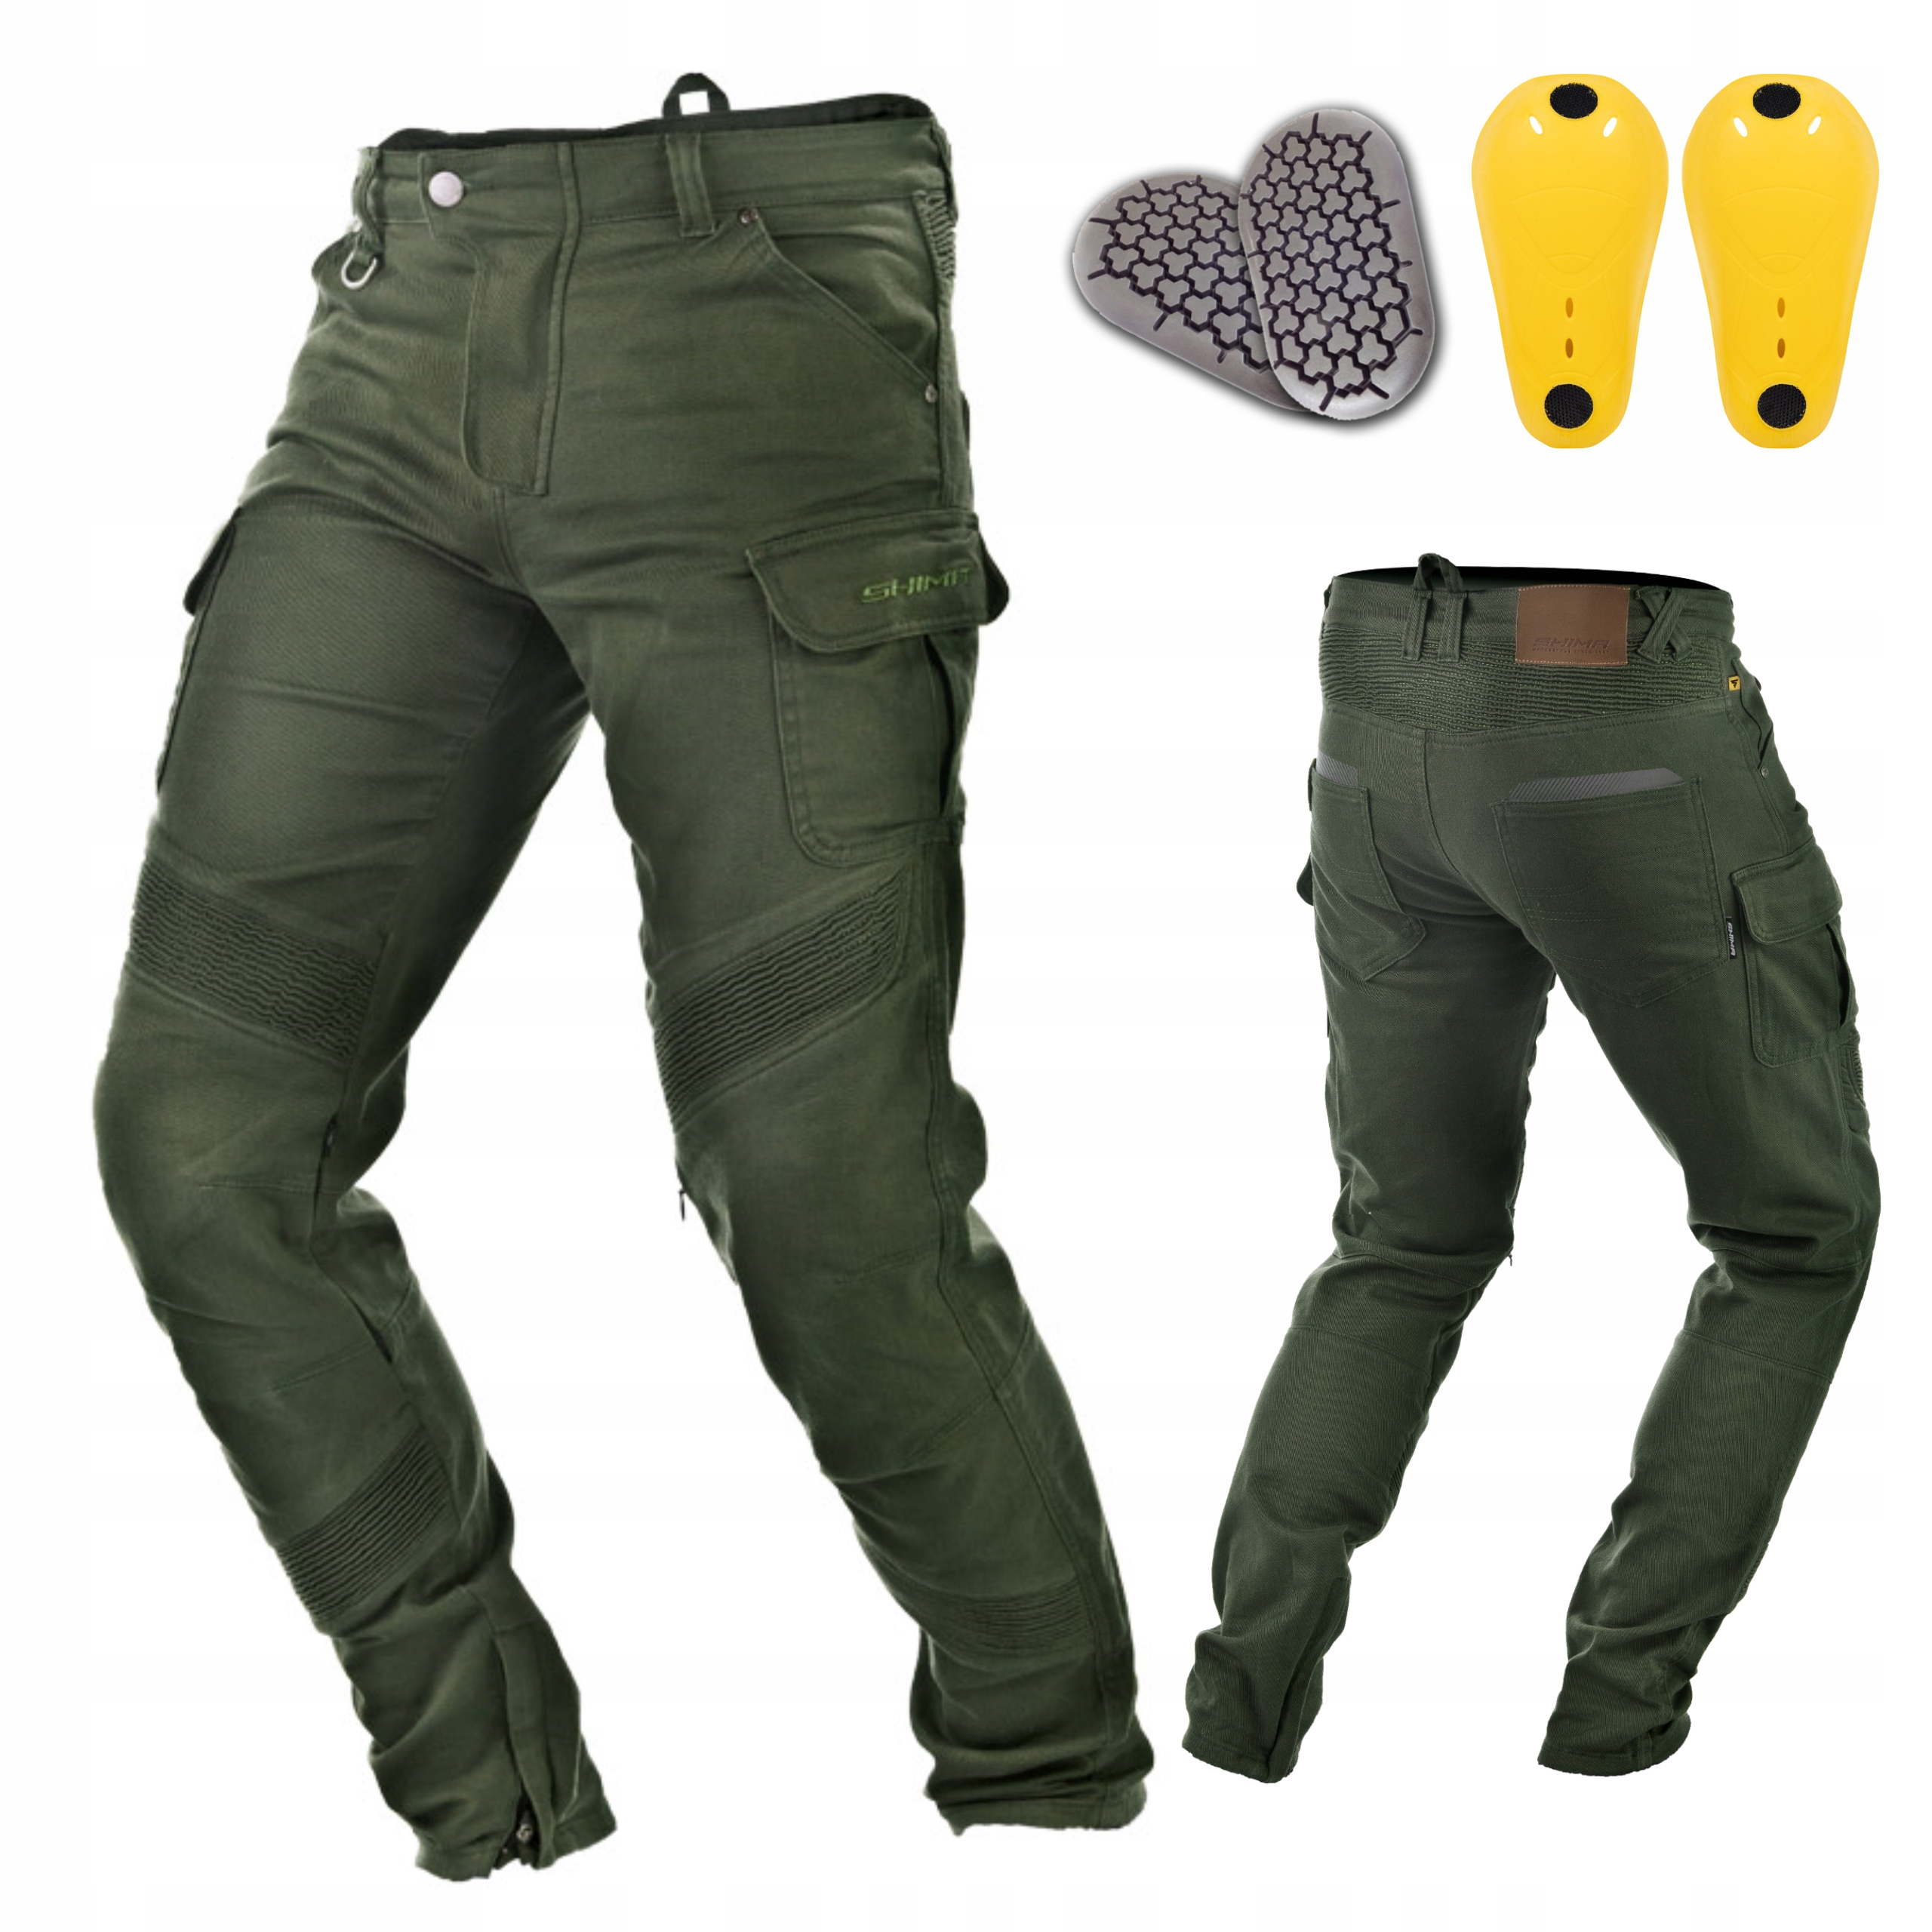 Мотоциклетные брюки карго SHIMA GIRO + FREE